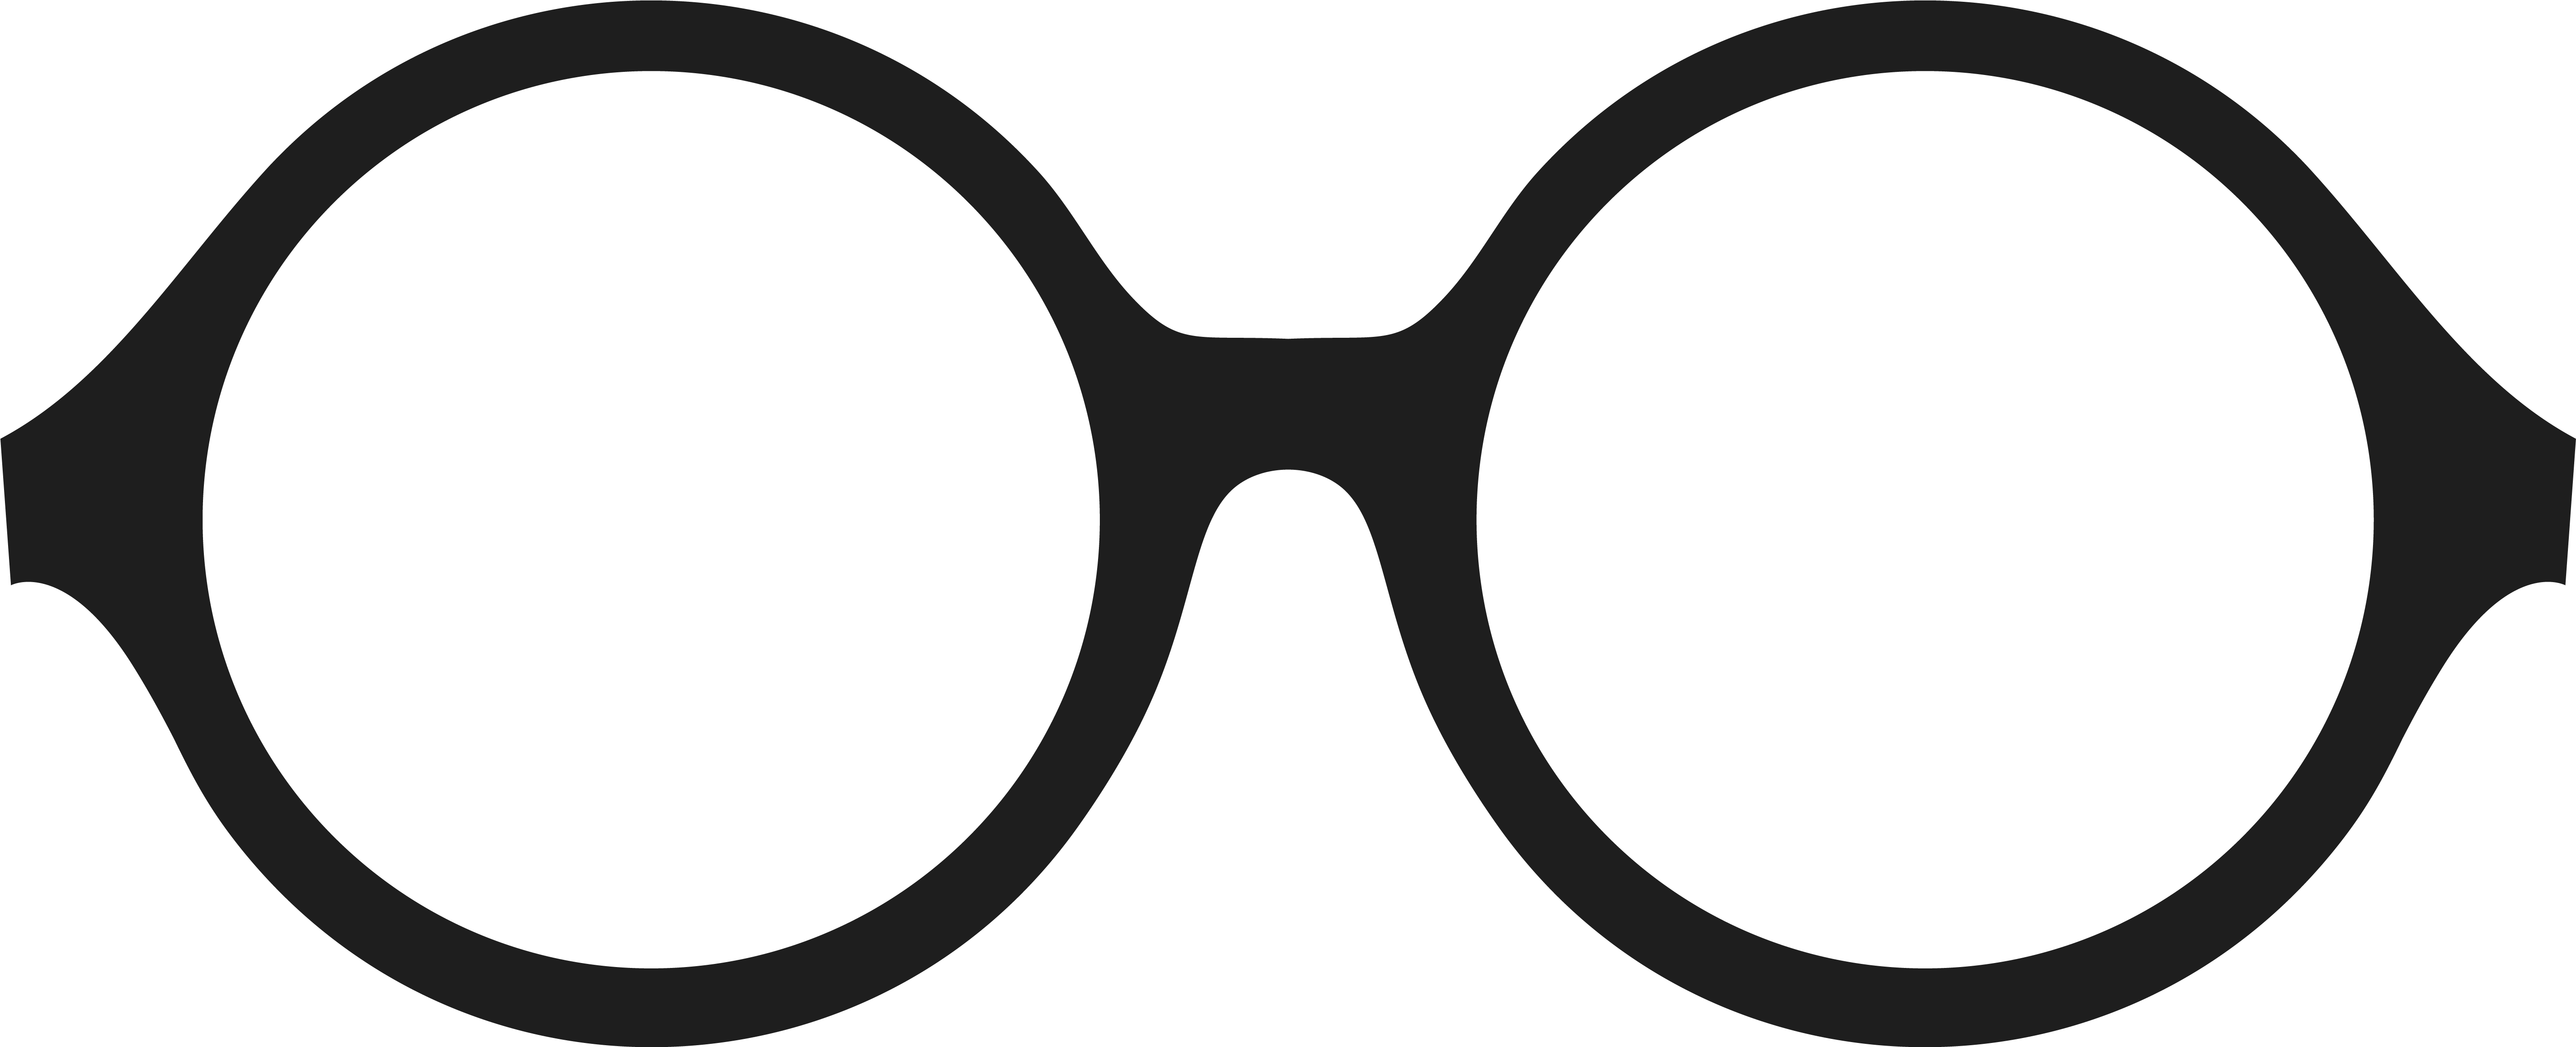 Eyeglasses clipart circle. Download free png hd